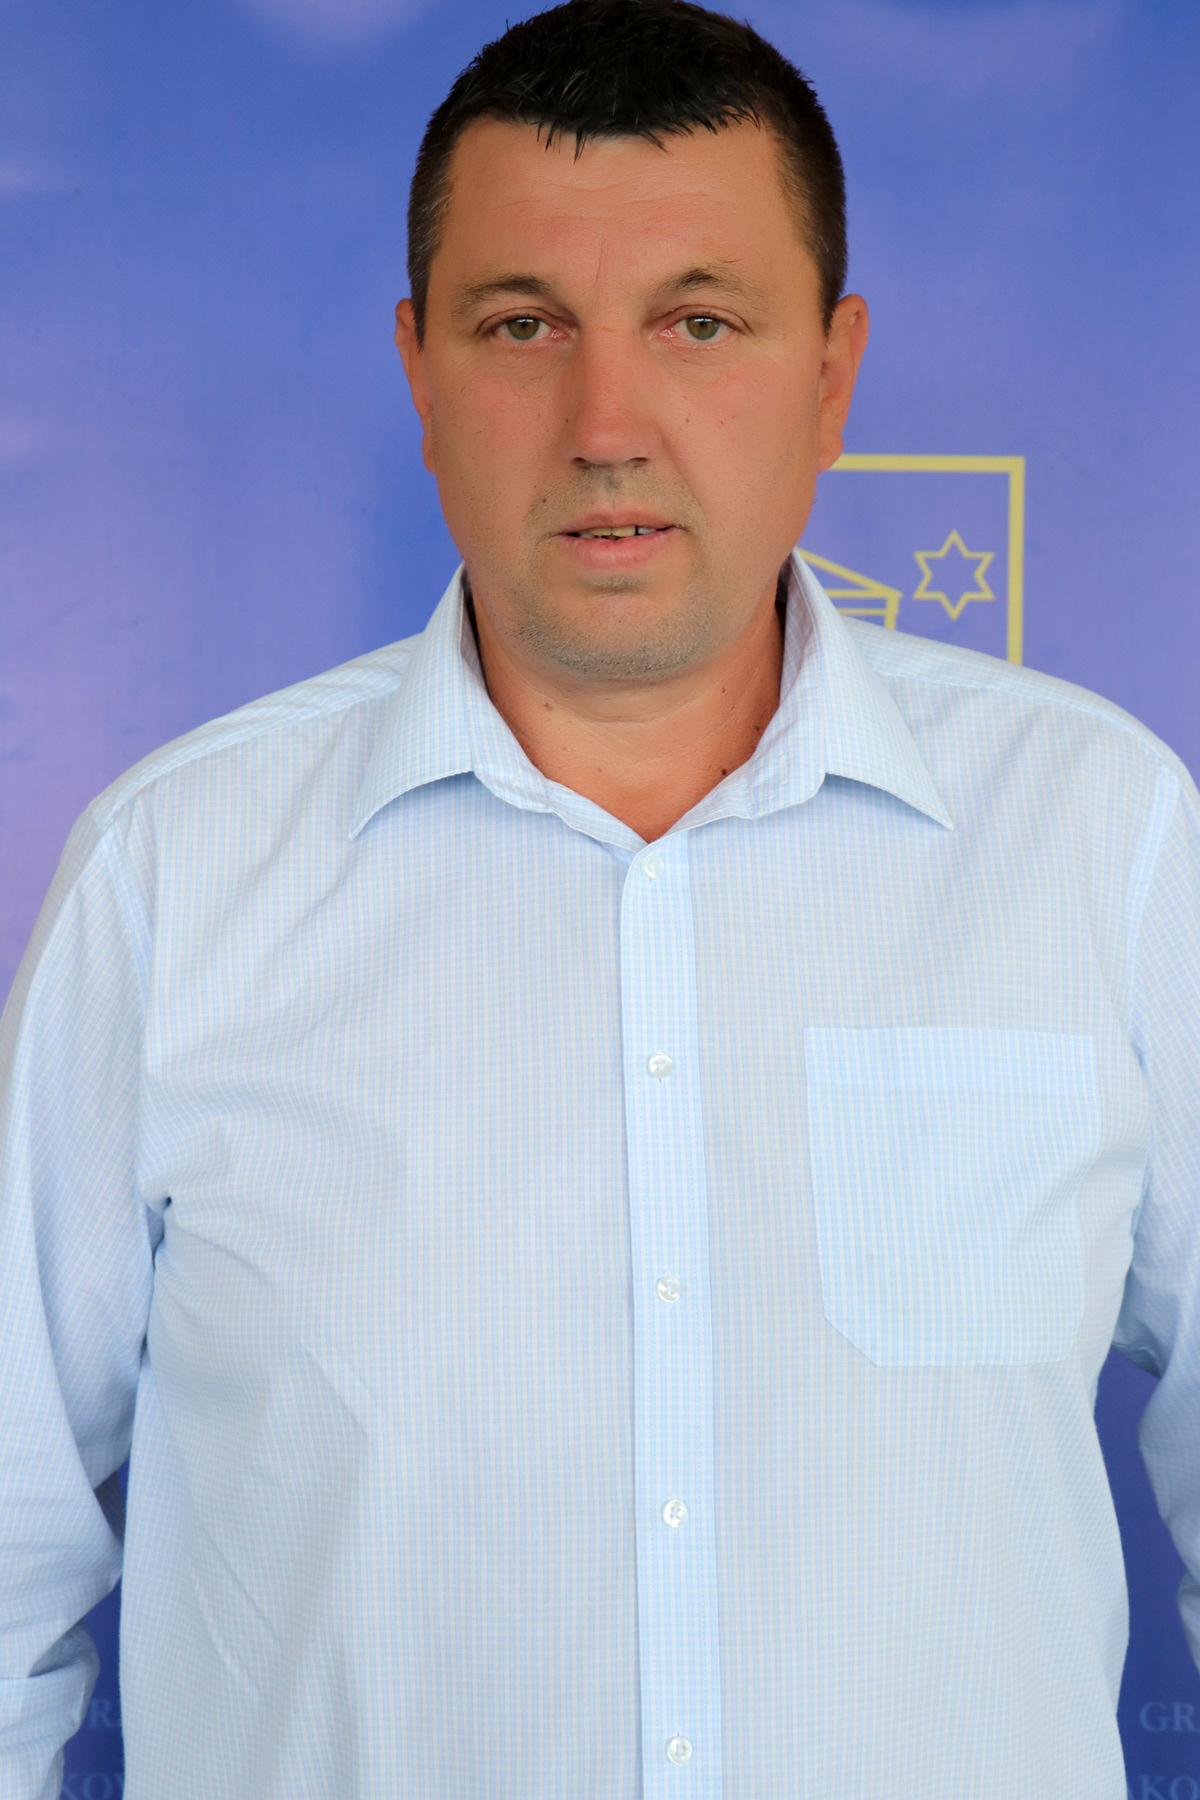 David Milić